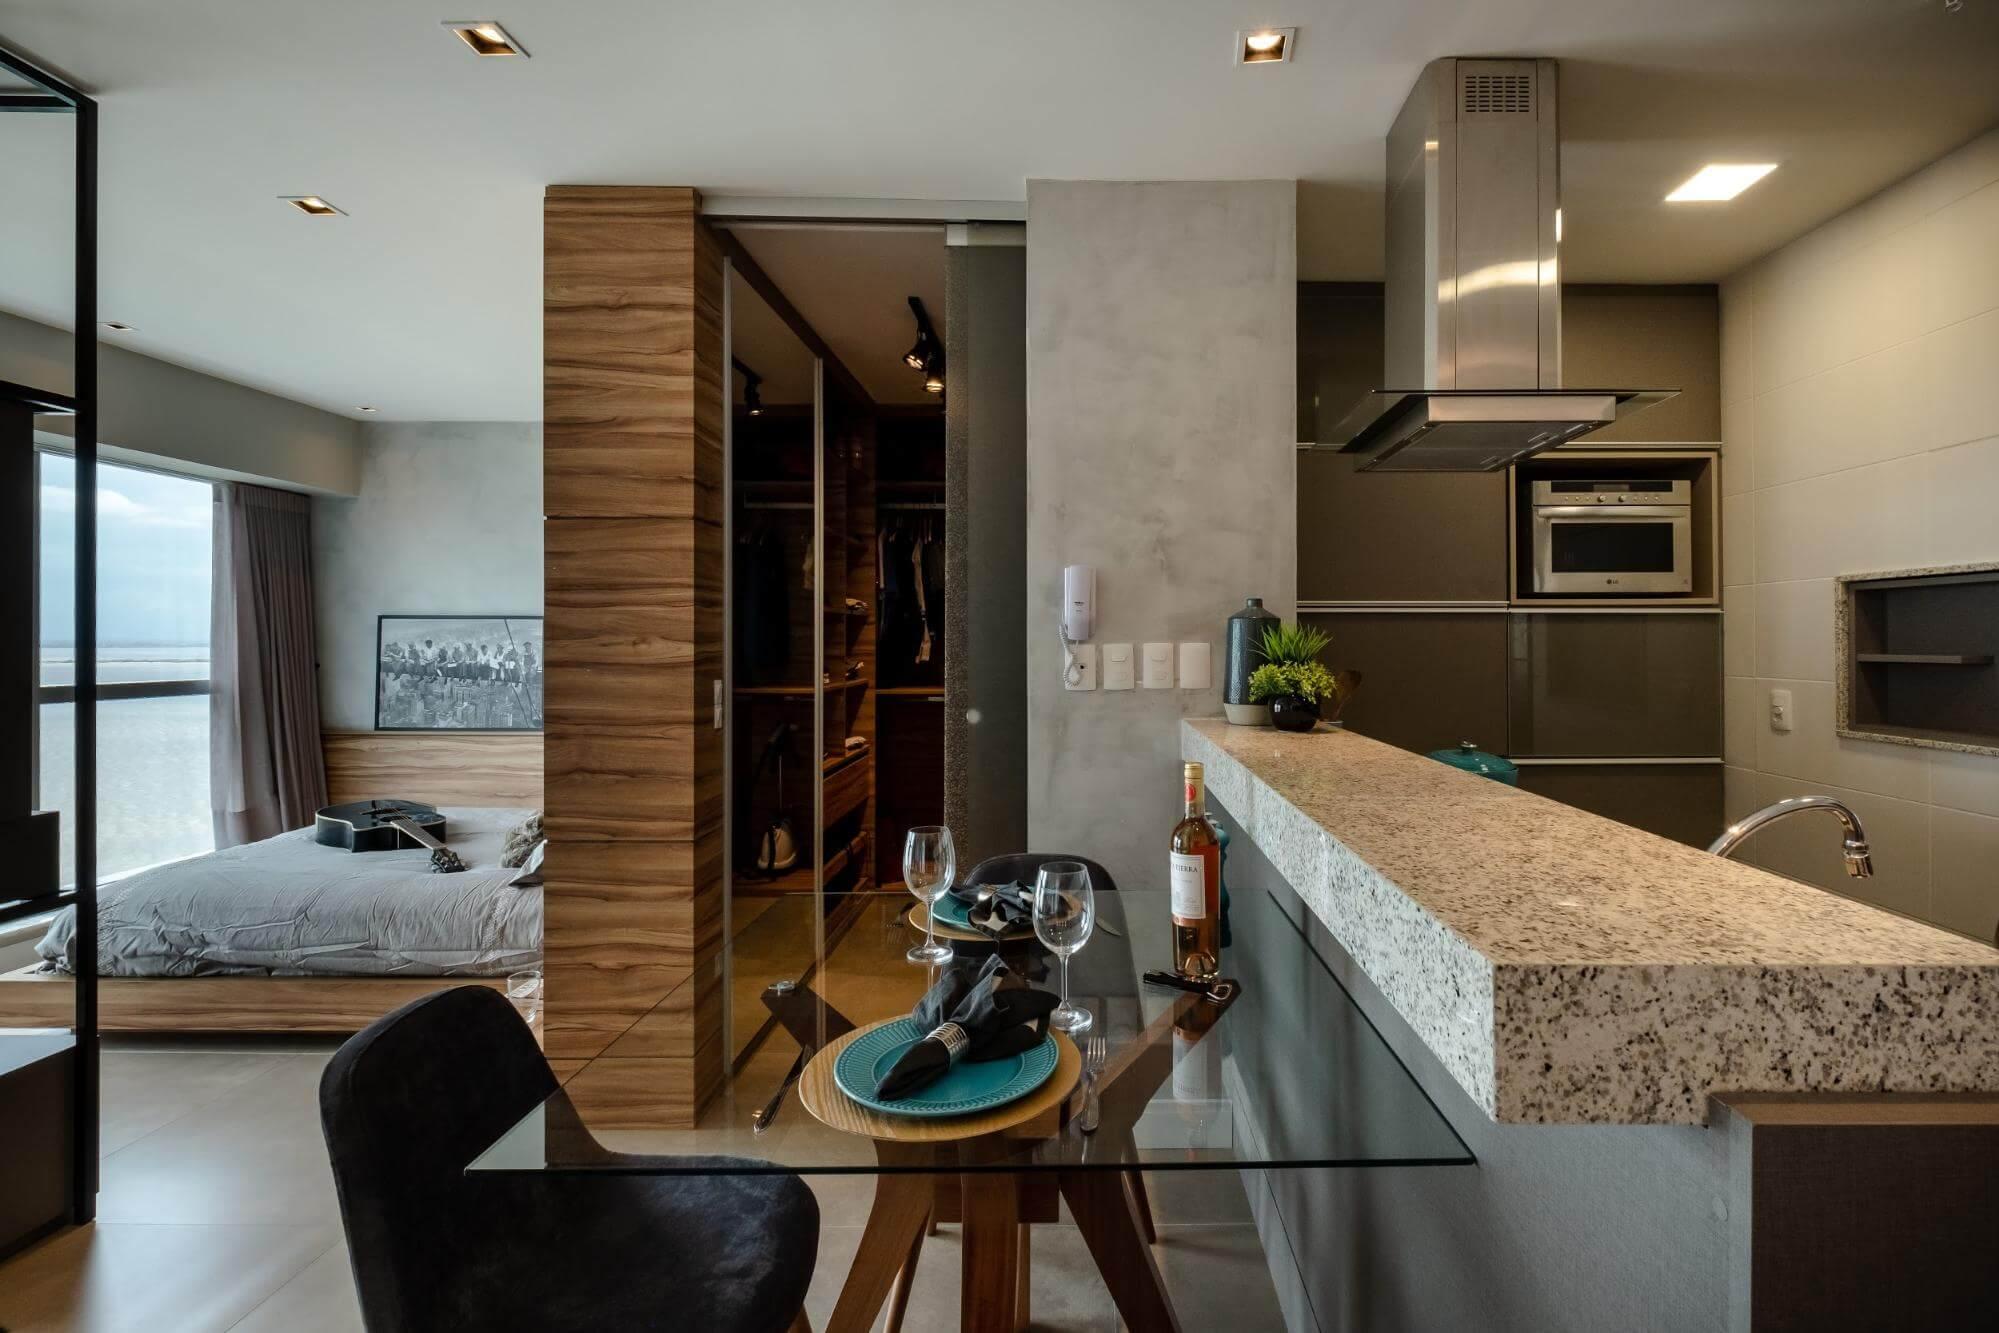 Apartamento pequeno - integrar ambientes